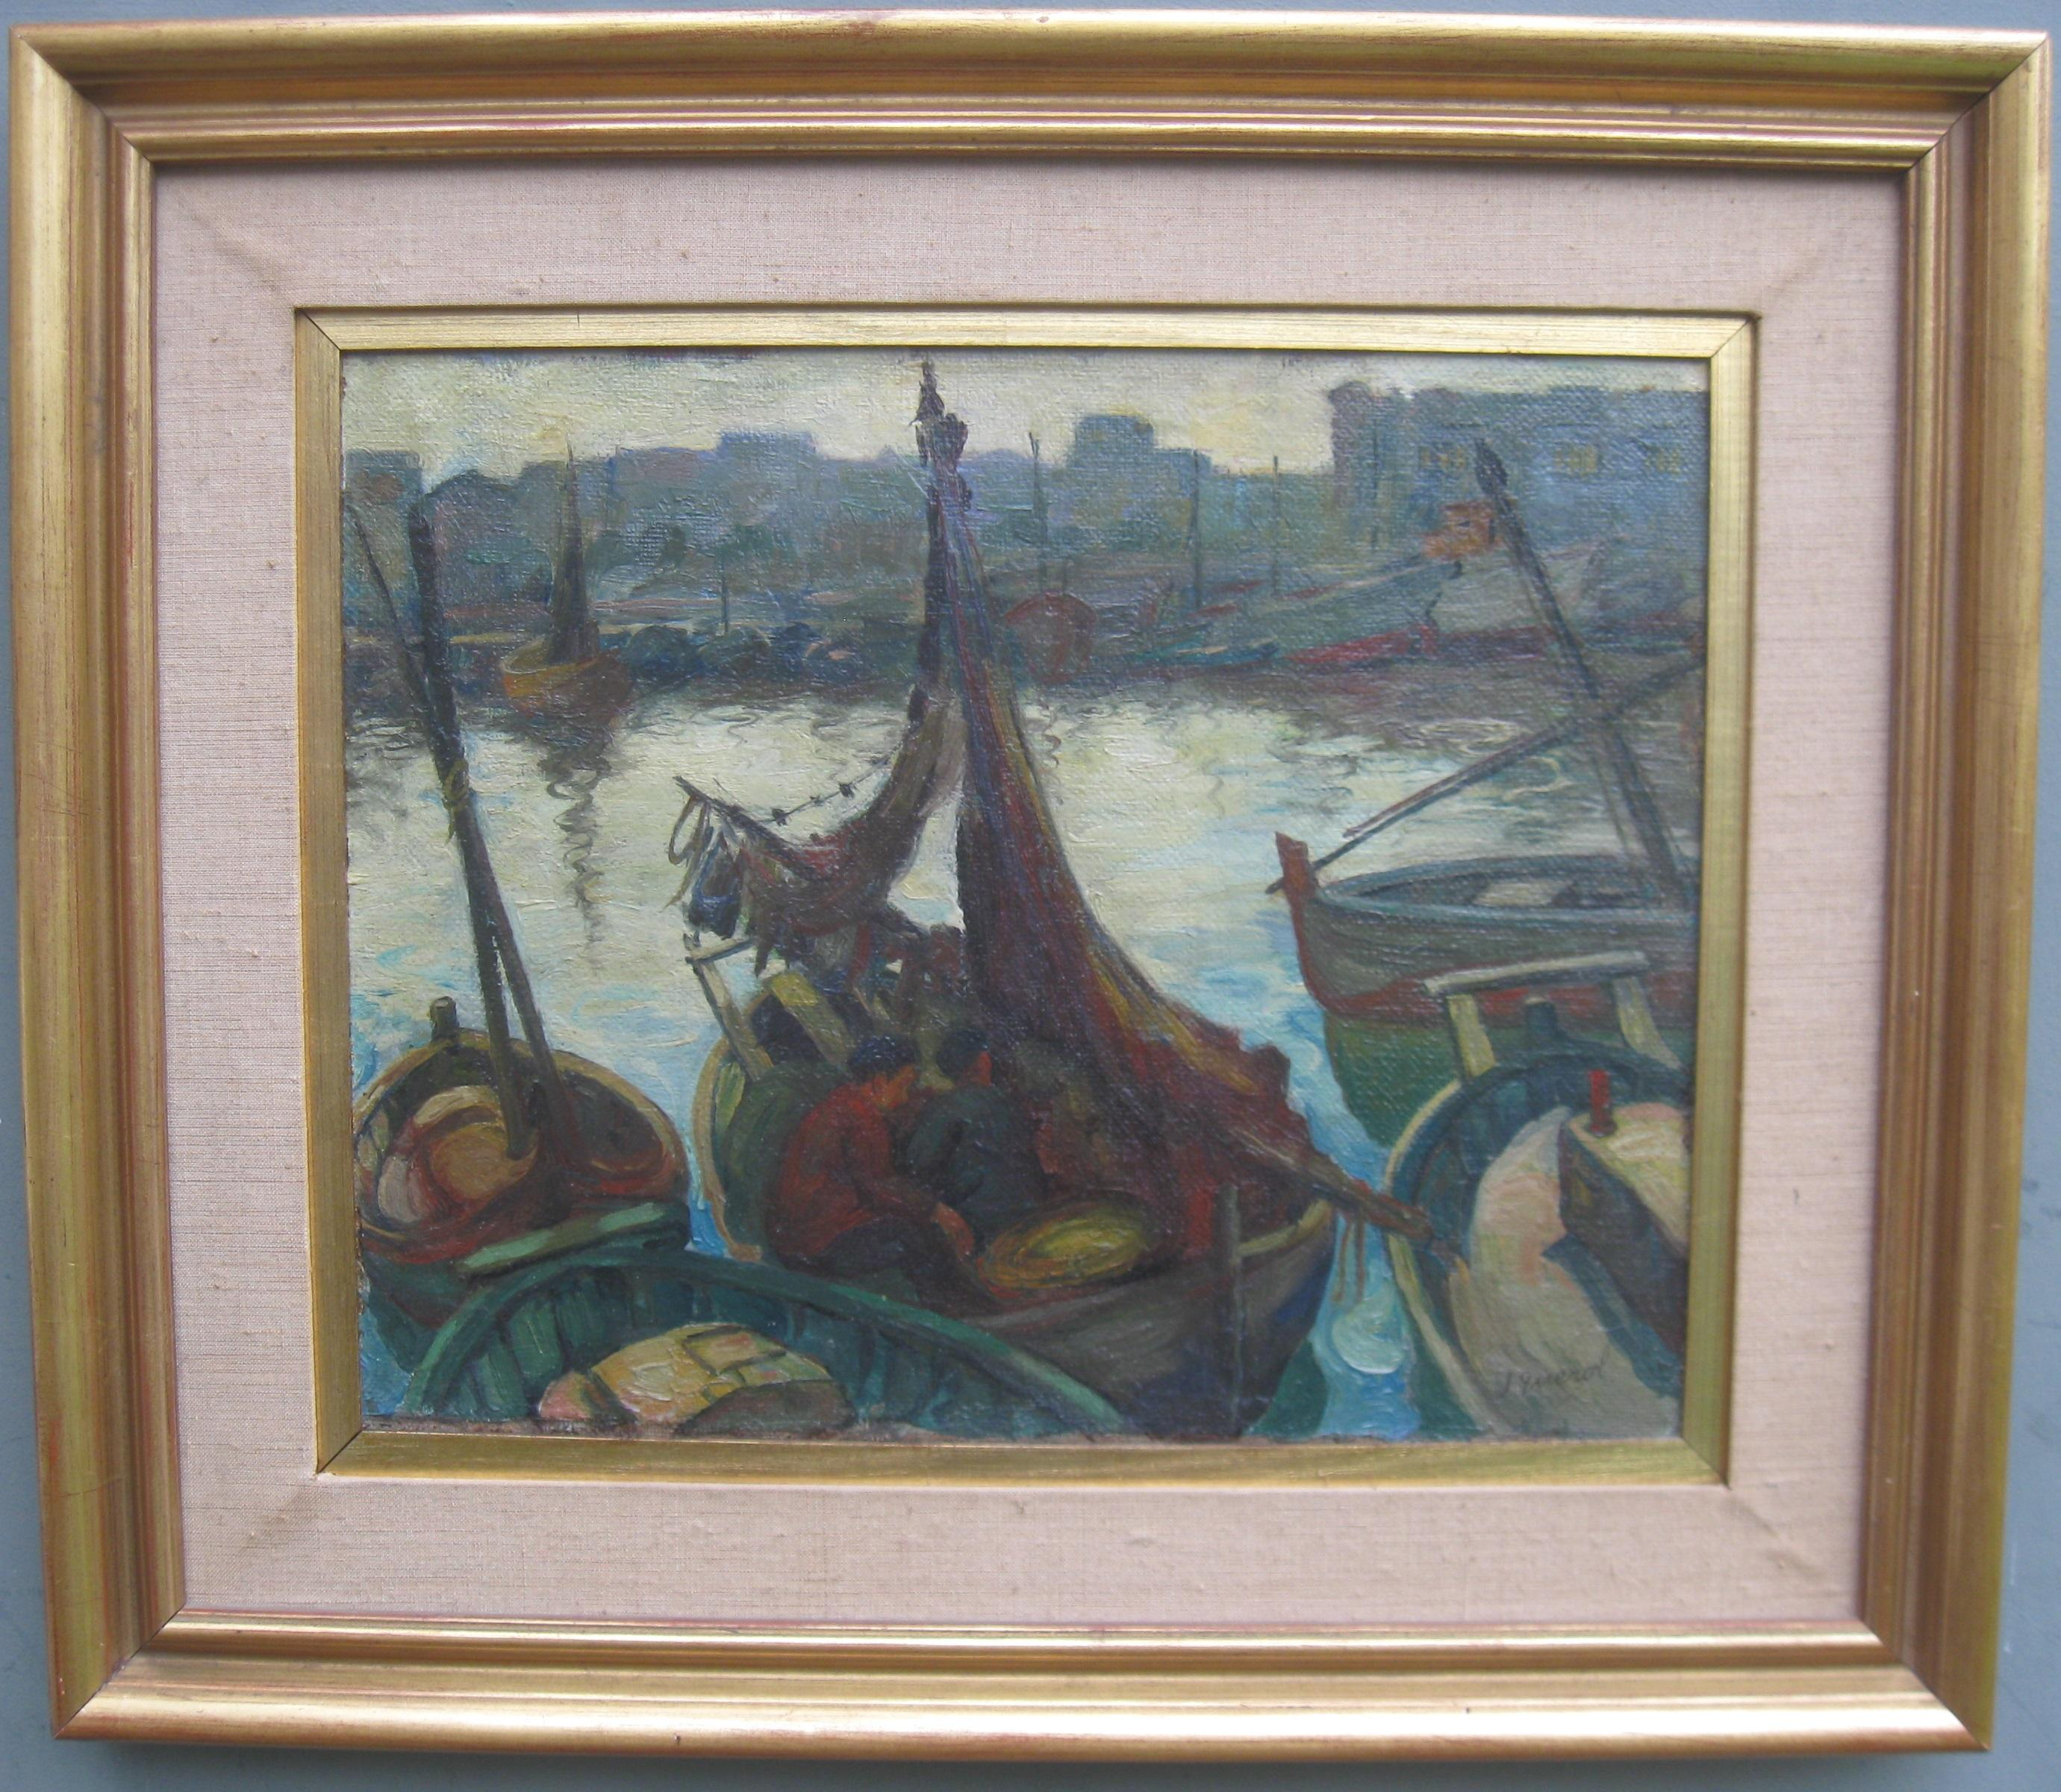 'Landing the Catch', Harbour Evening Scene oil on canvas circa 1950's